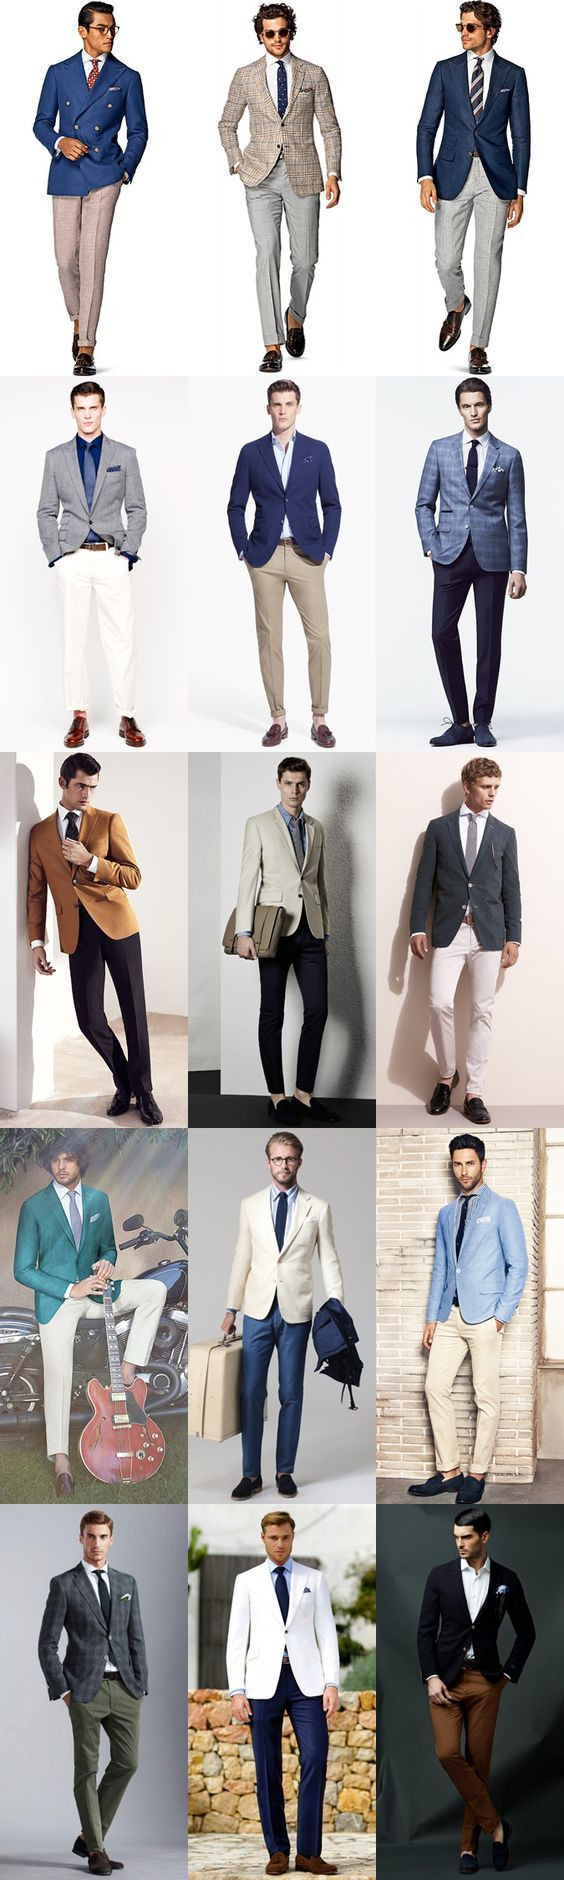 Summer Suit ideas 2018